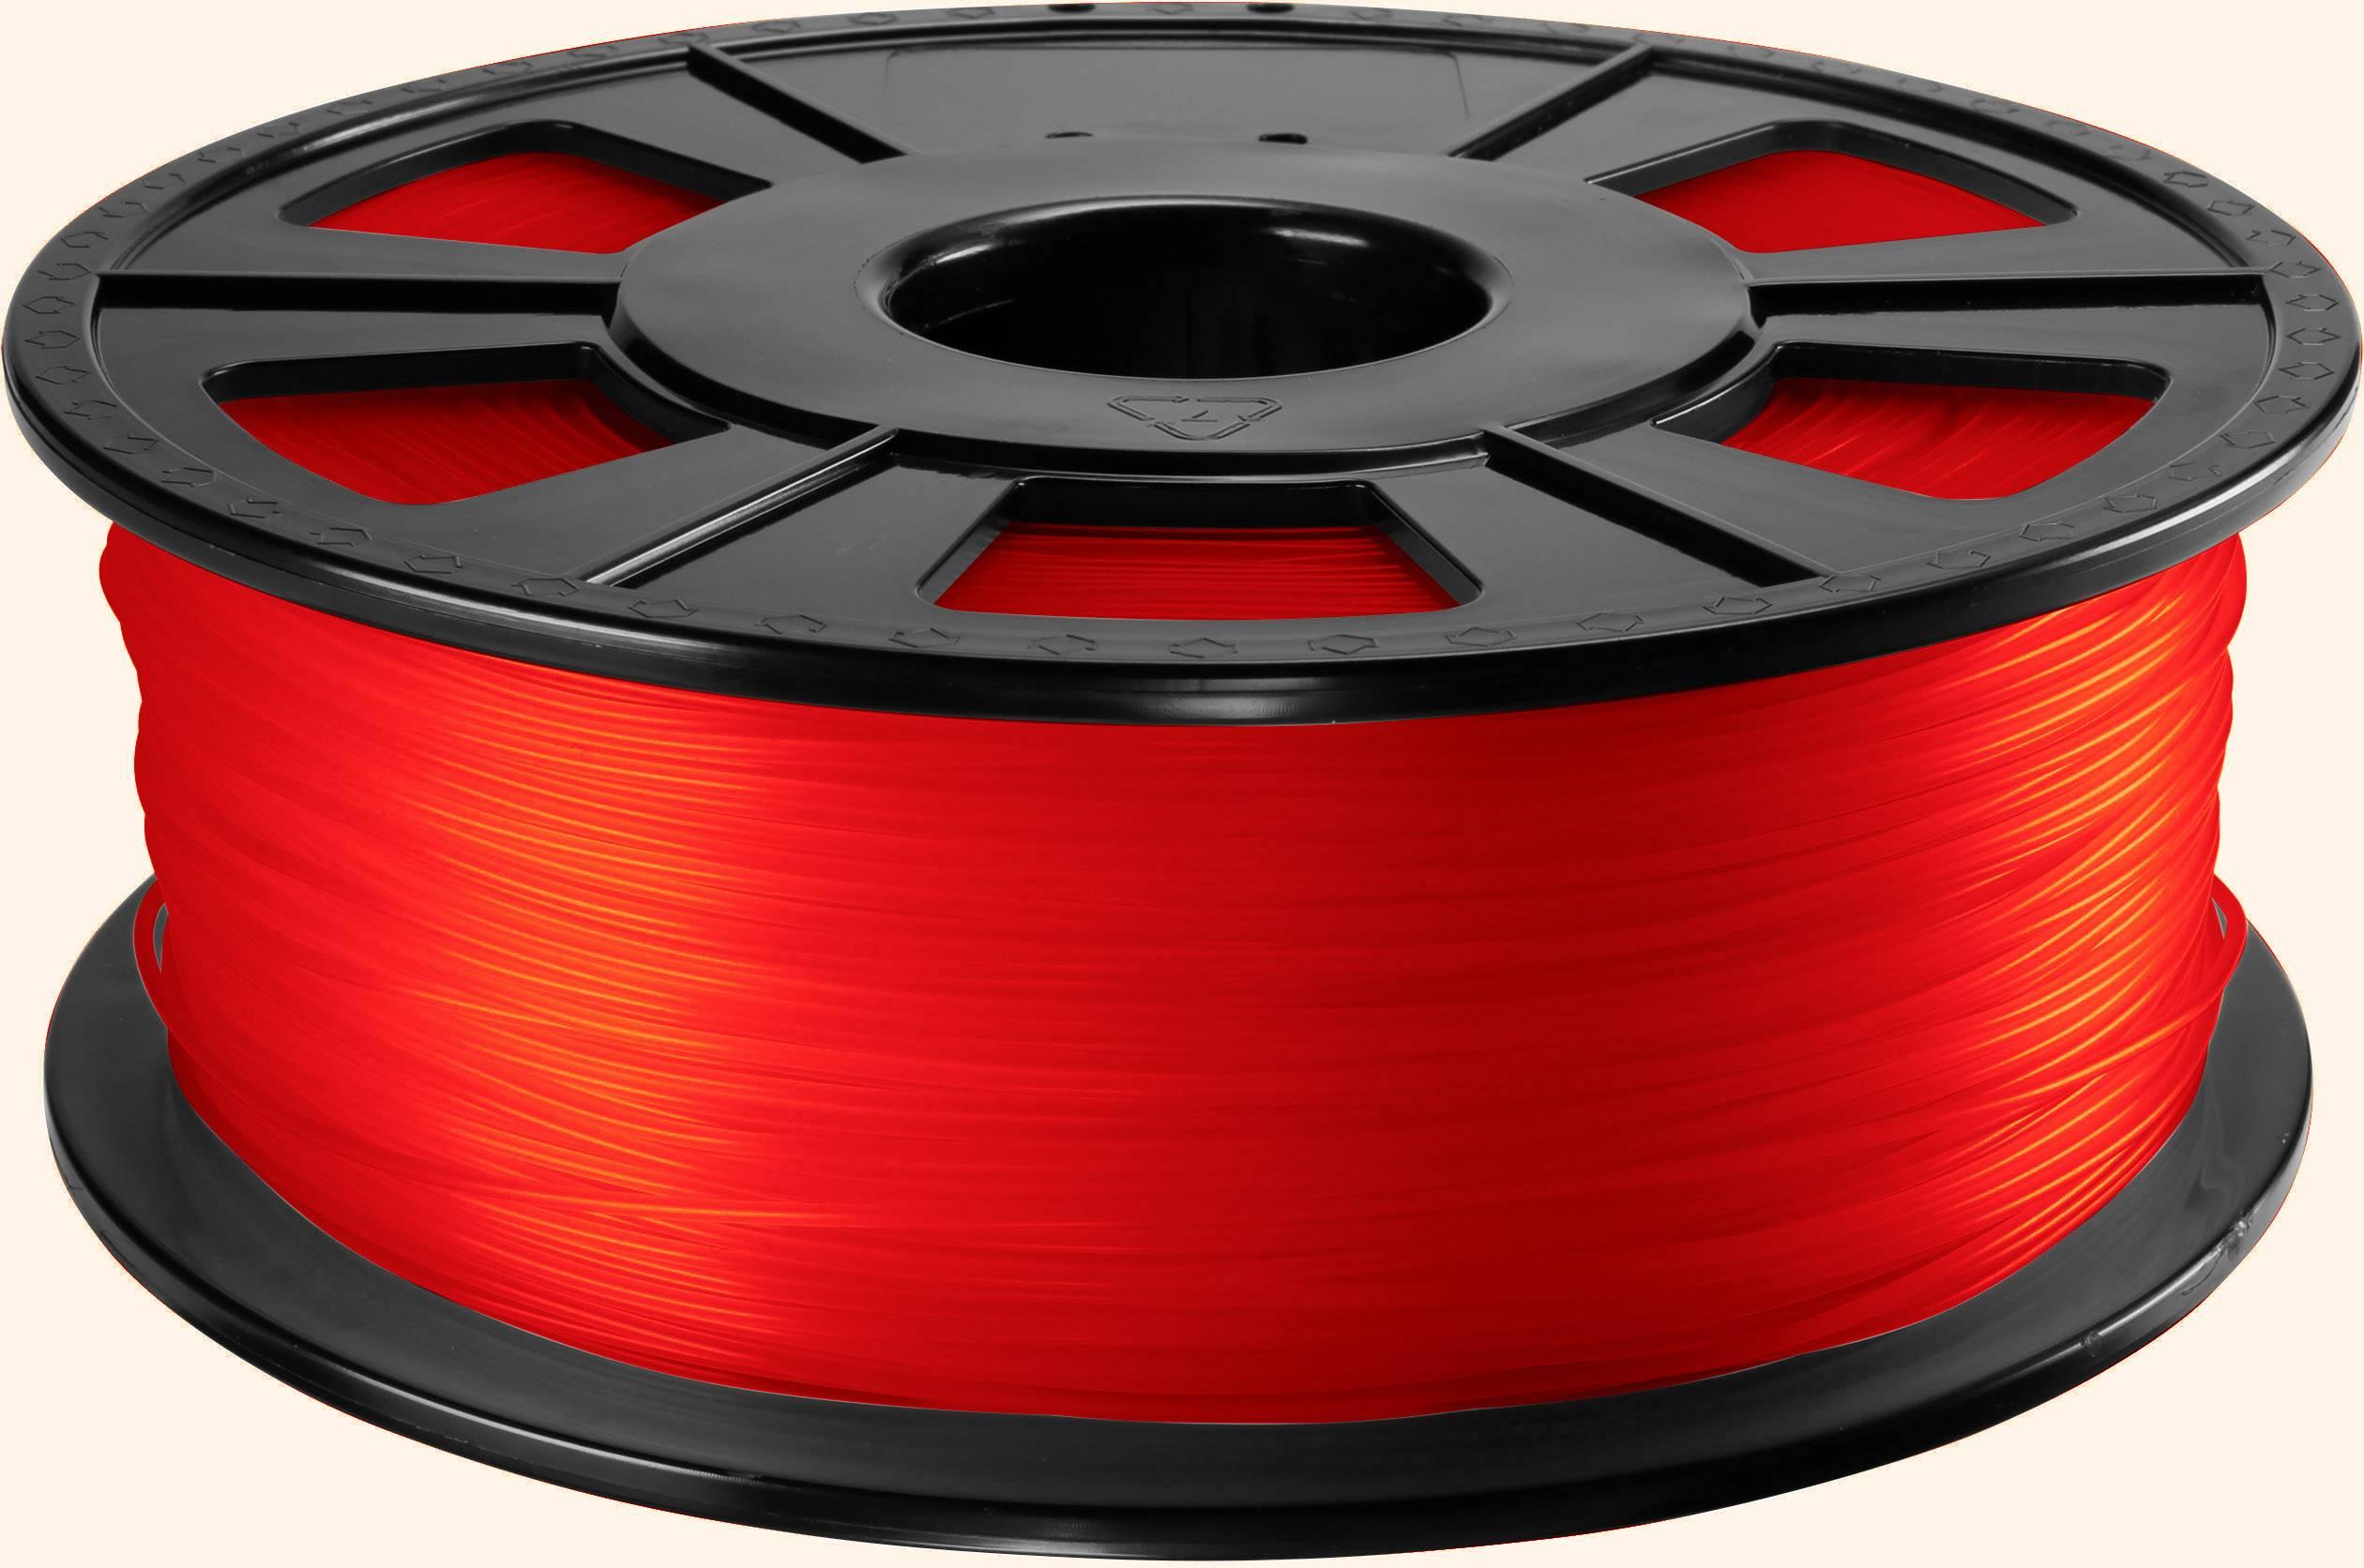 Vlákno pre 3Dtlačiarne, Renkforce 01.04.18.1204, PETG plast, 2.85 mm, 1 kg, červená